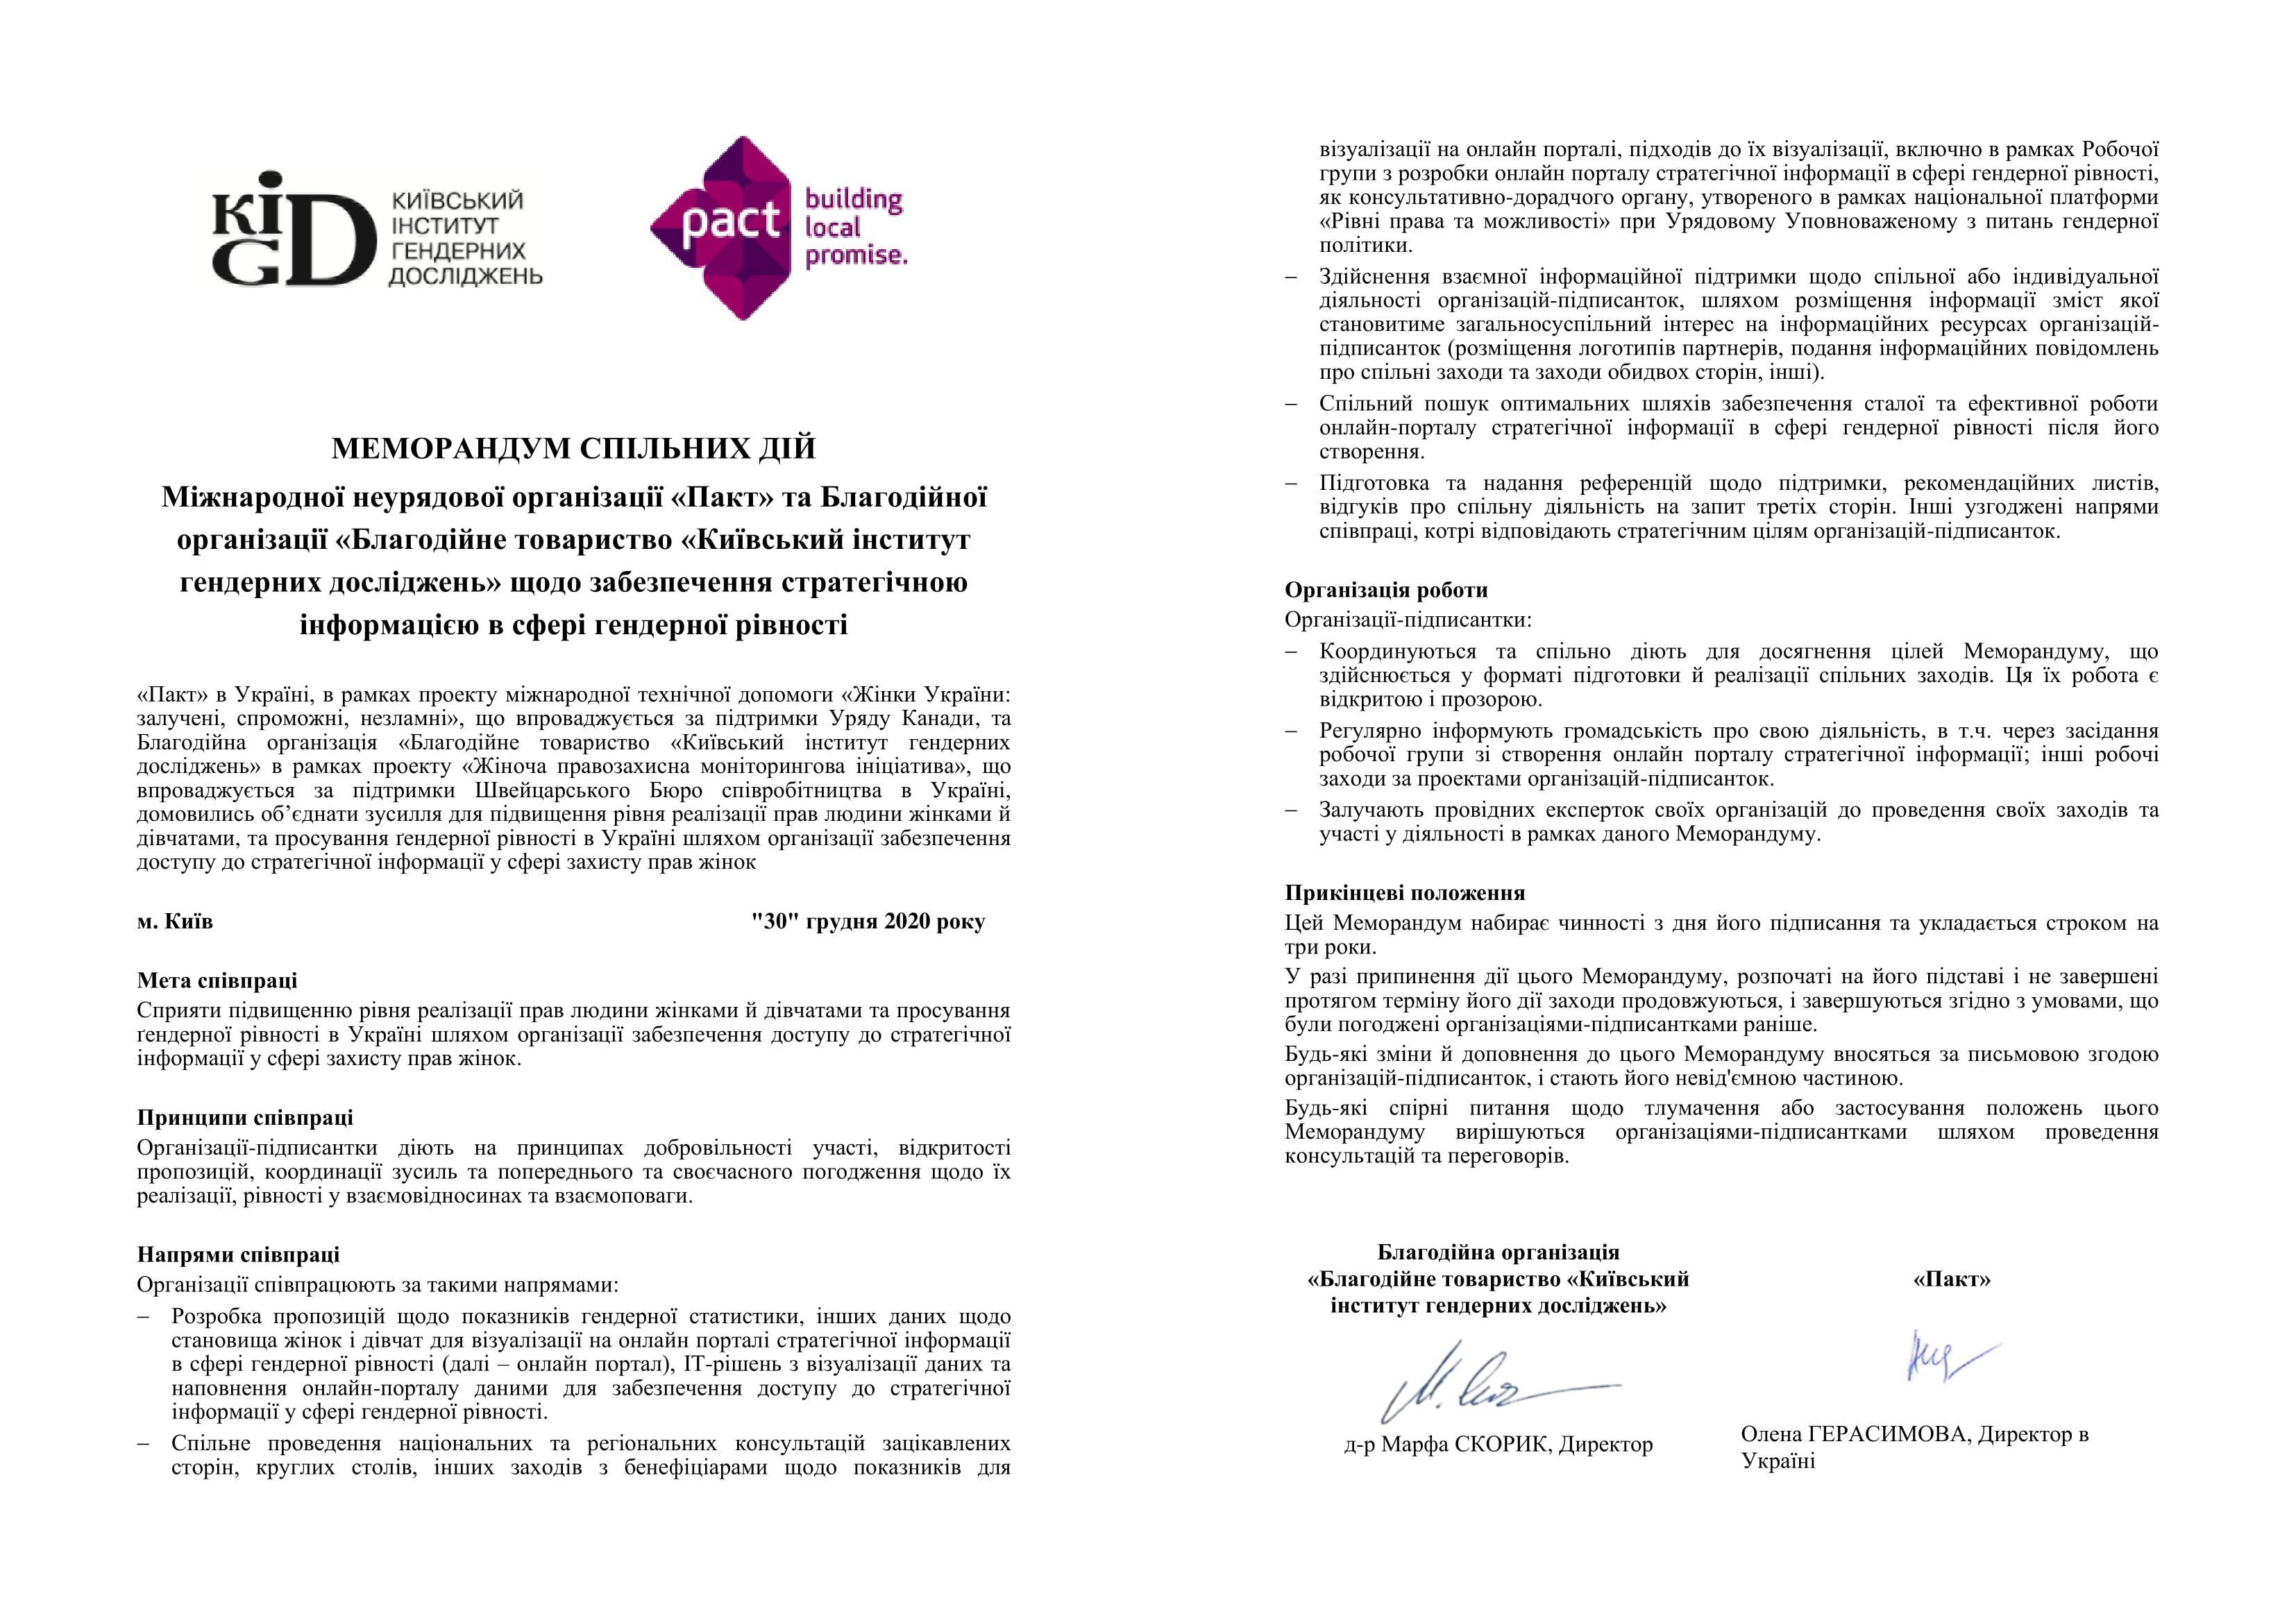 Pact-kigs-memorandum-december-30-2020-ukr-fin